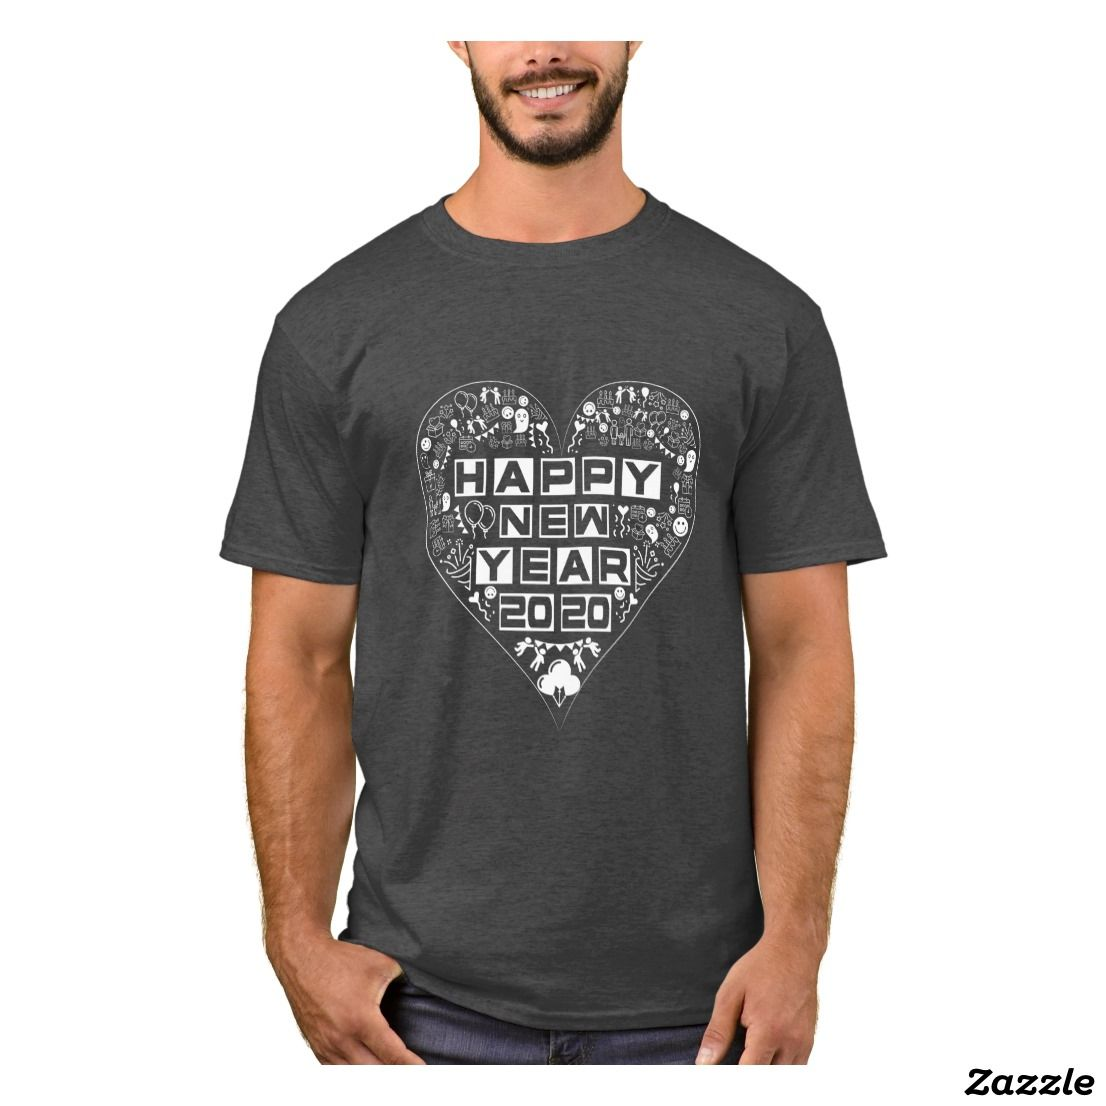 Create your own tshirt shirts t shirt